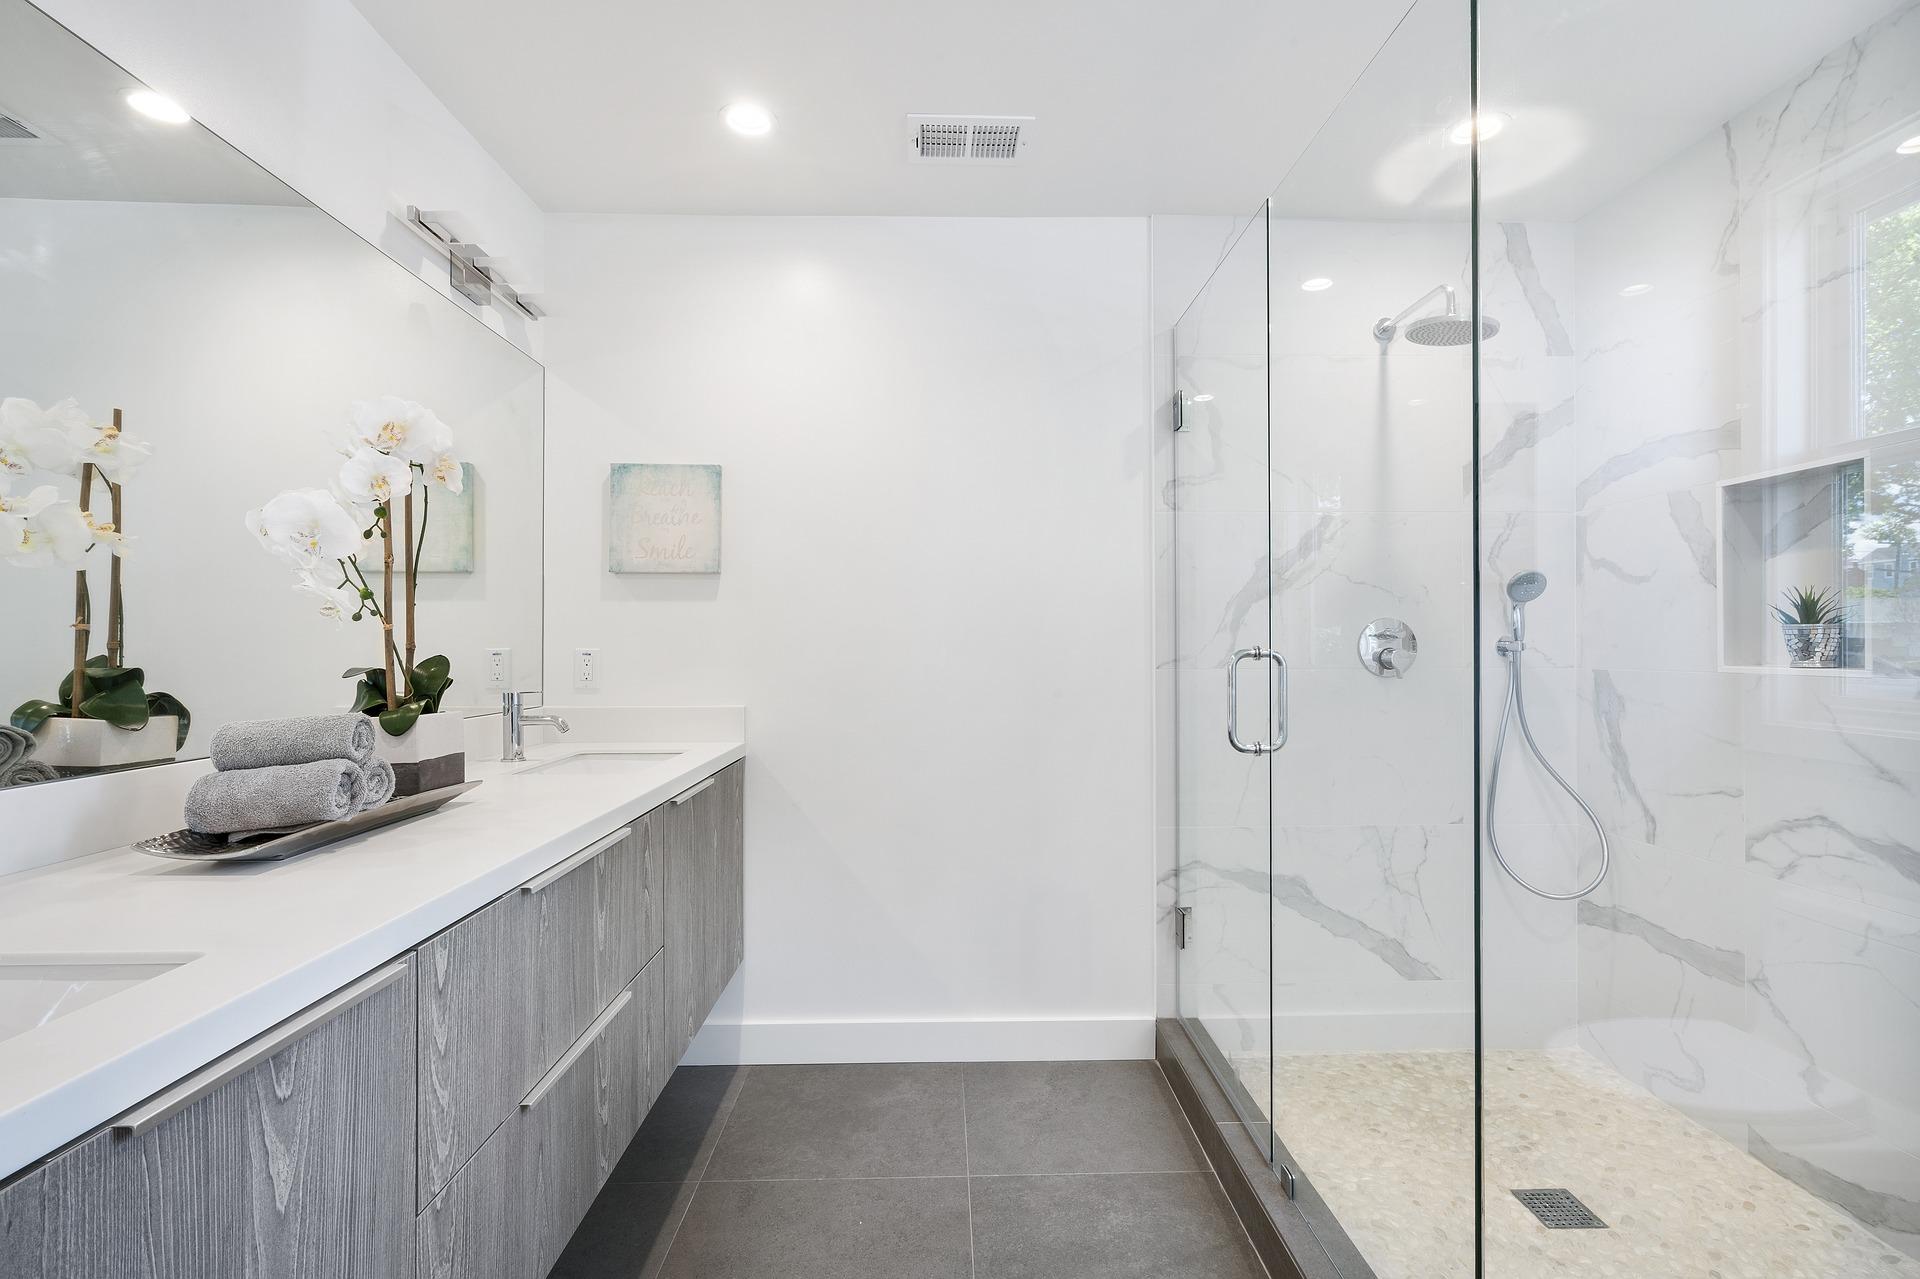 How to prevent bathroom humidity-modern bathroom